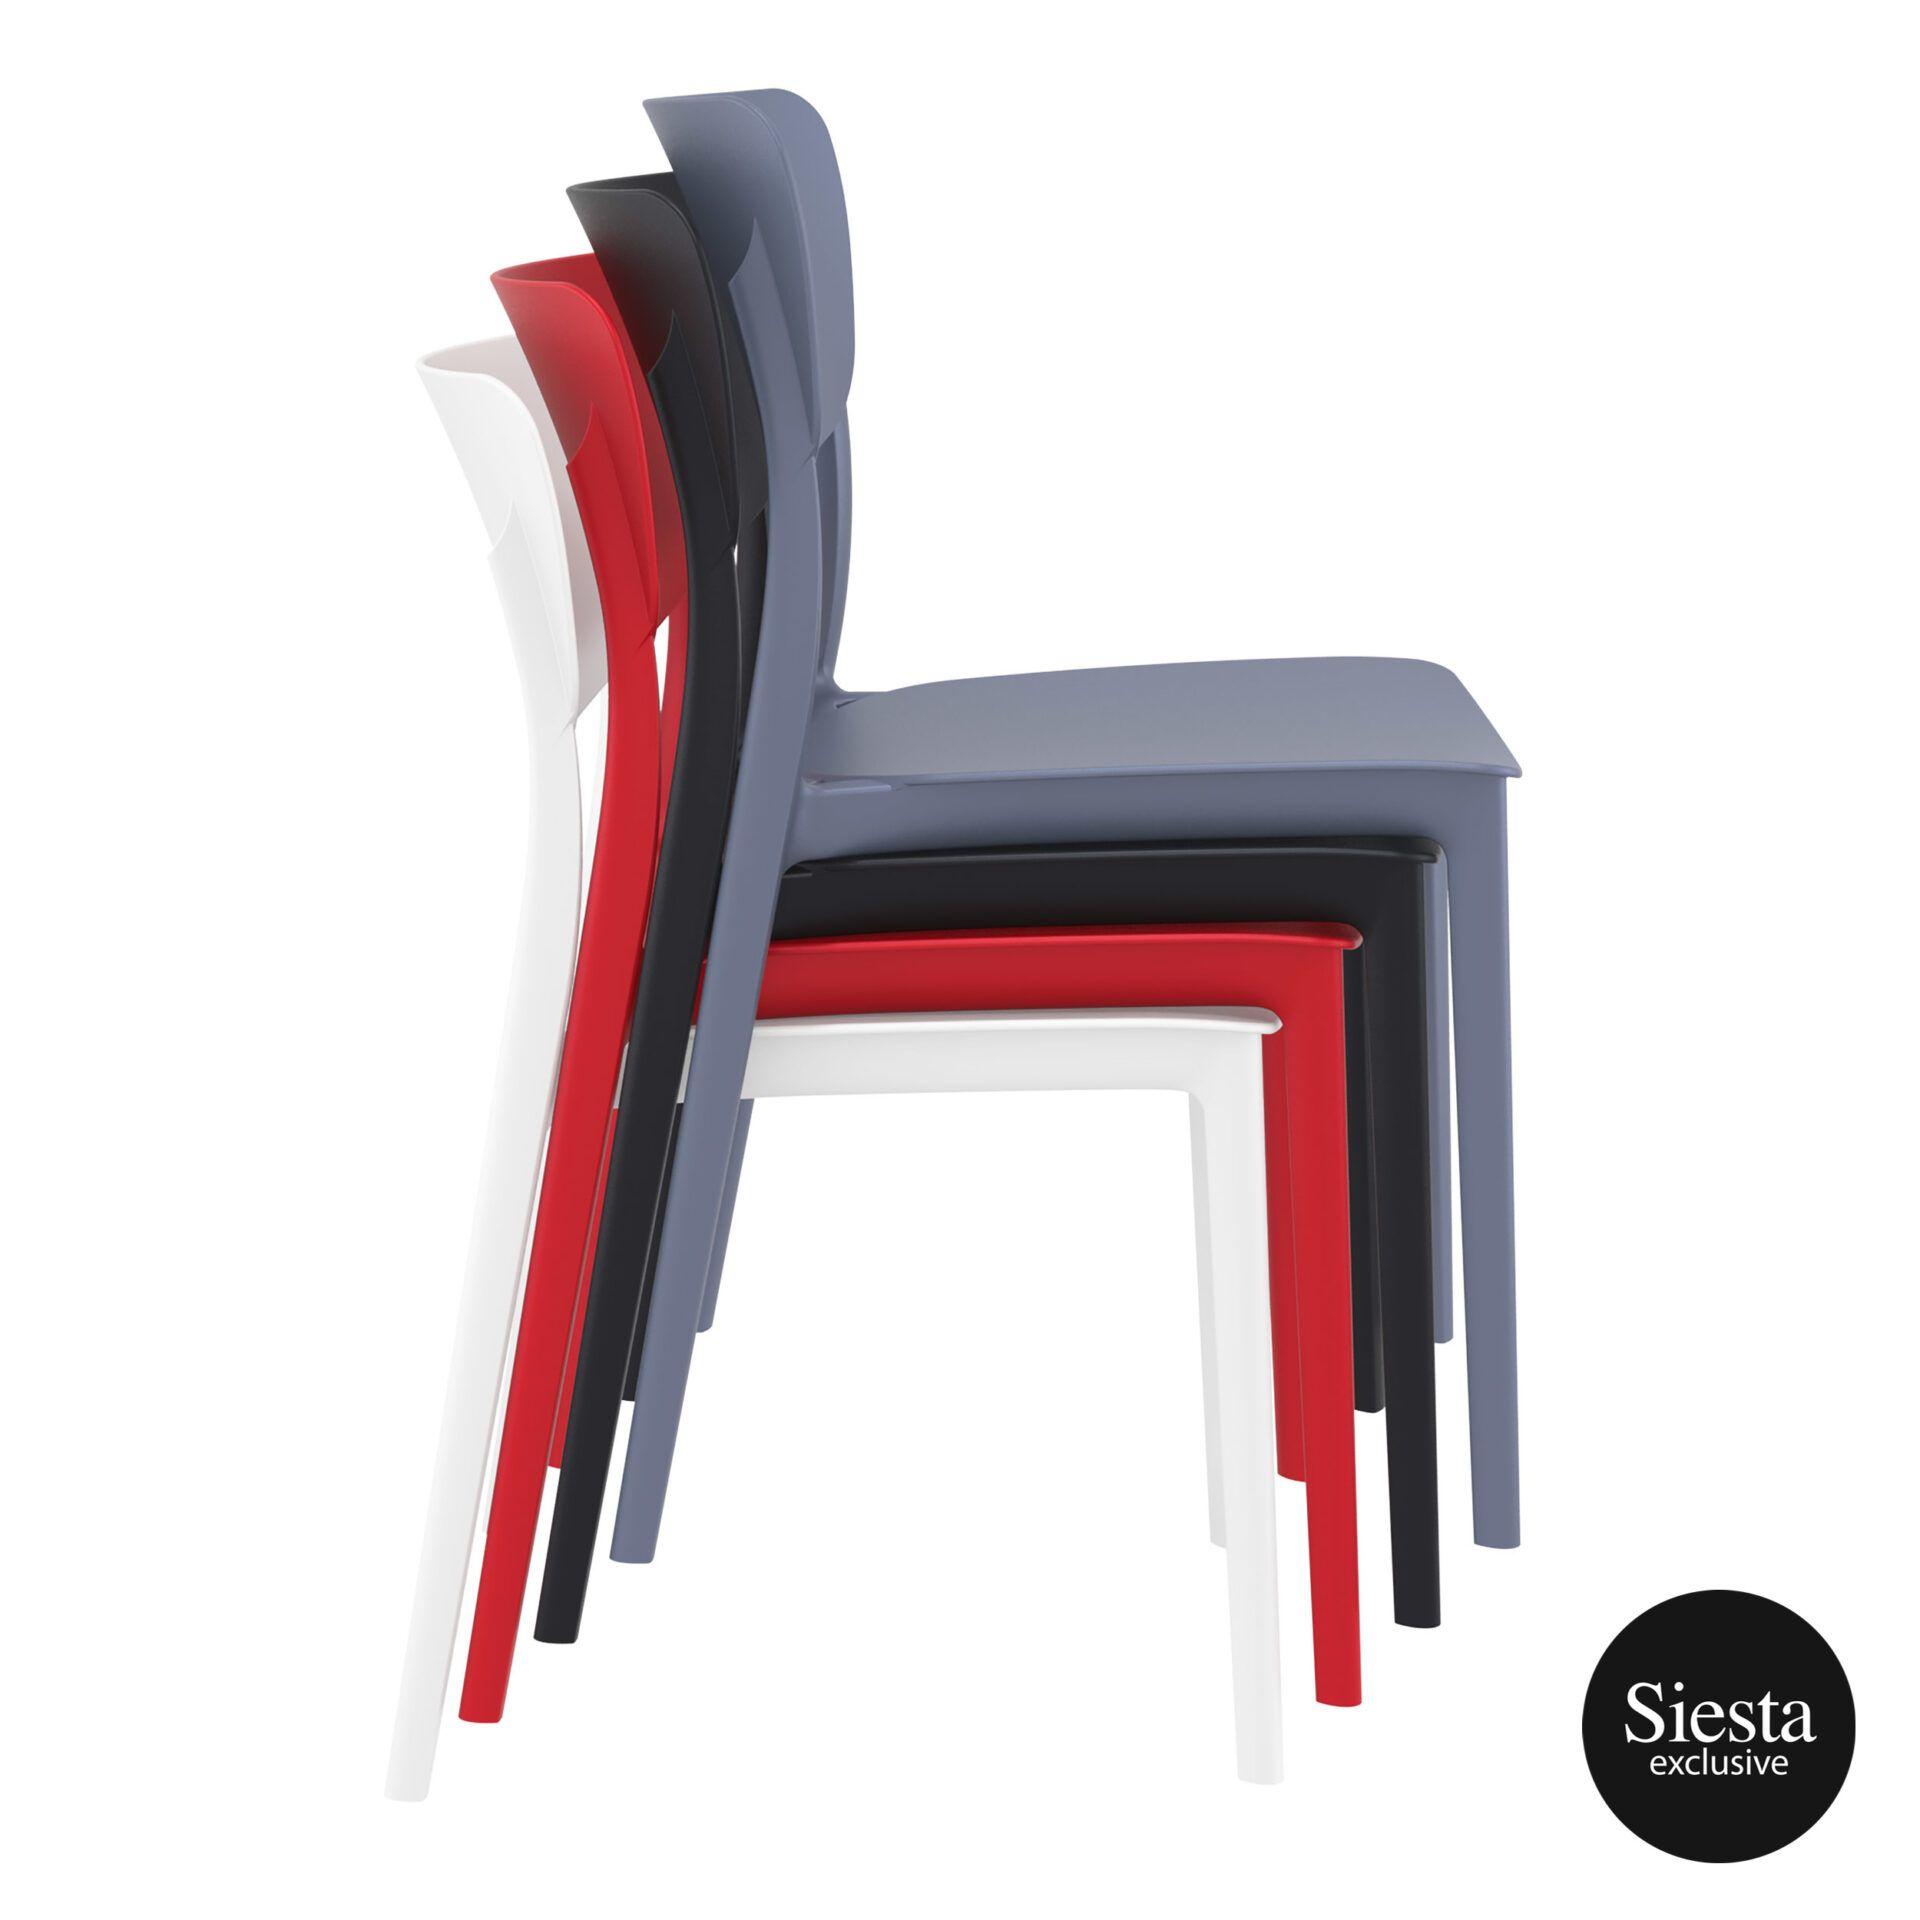 polypropylene outdoor dining monna chair stack 1